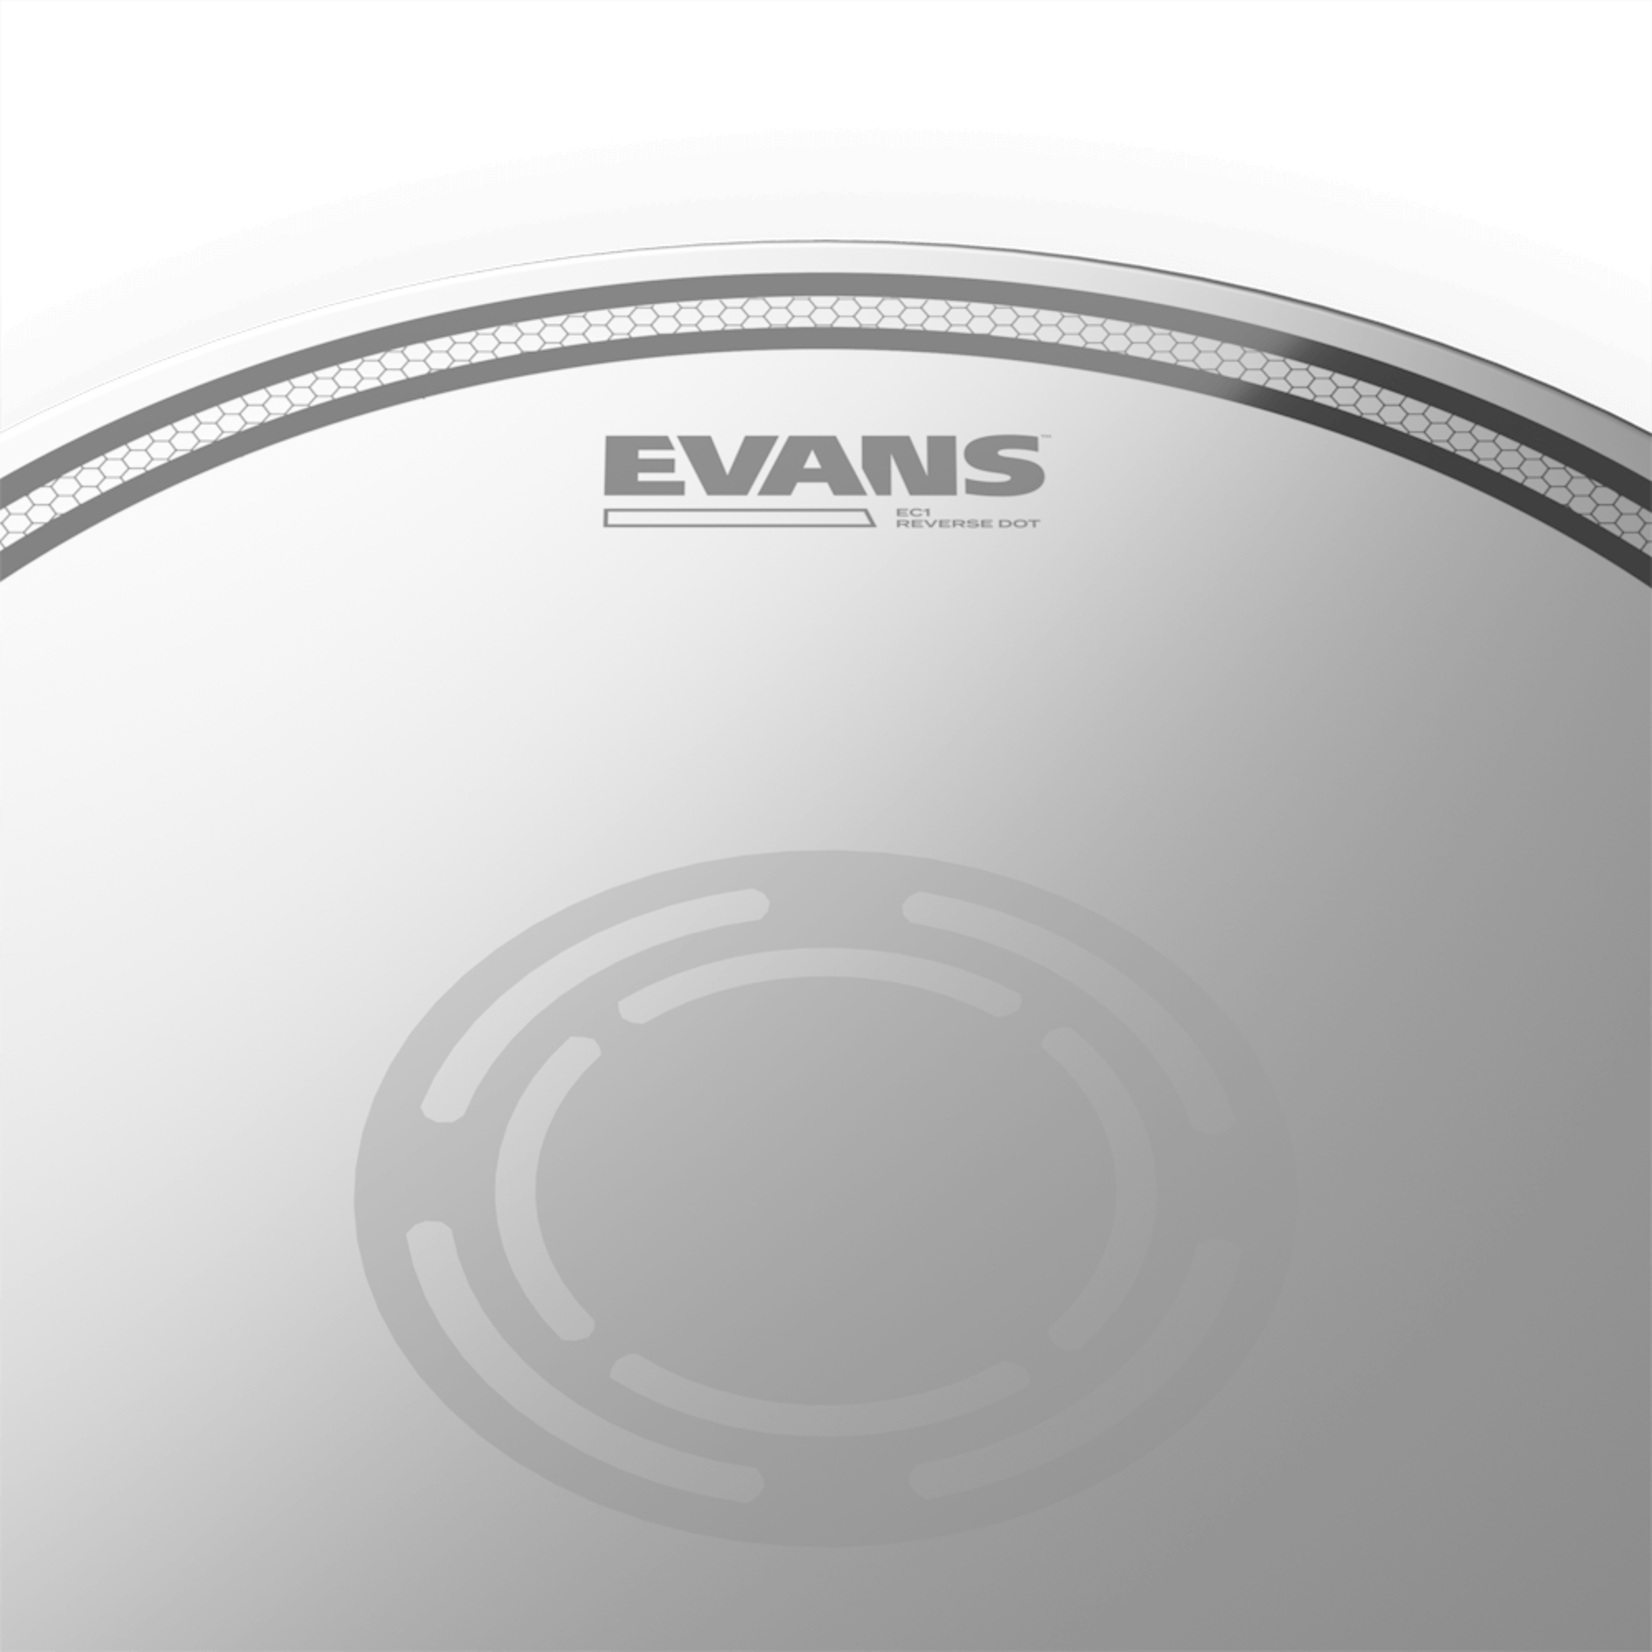 "Evans EVANS 14"" EC1 SNARE W/ REVERSE DOT B14EC1RD"